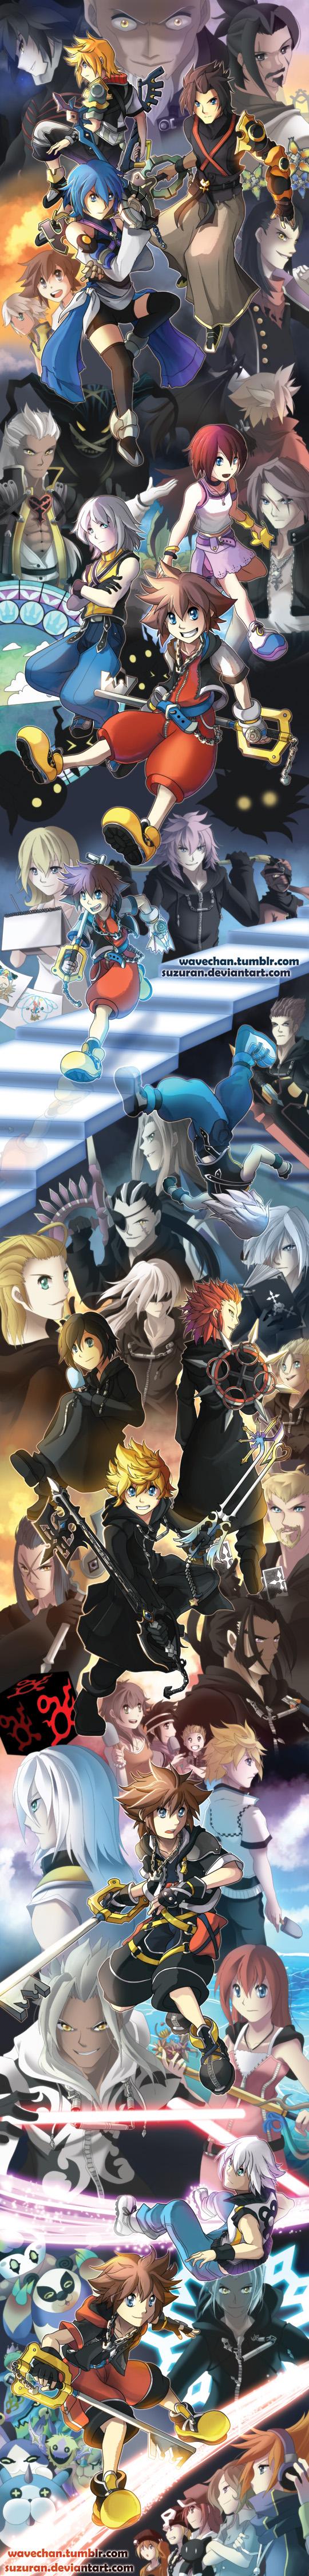 LOOOONG Kingdom Hearts Tribute